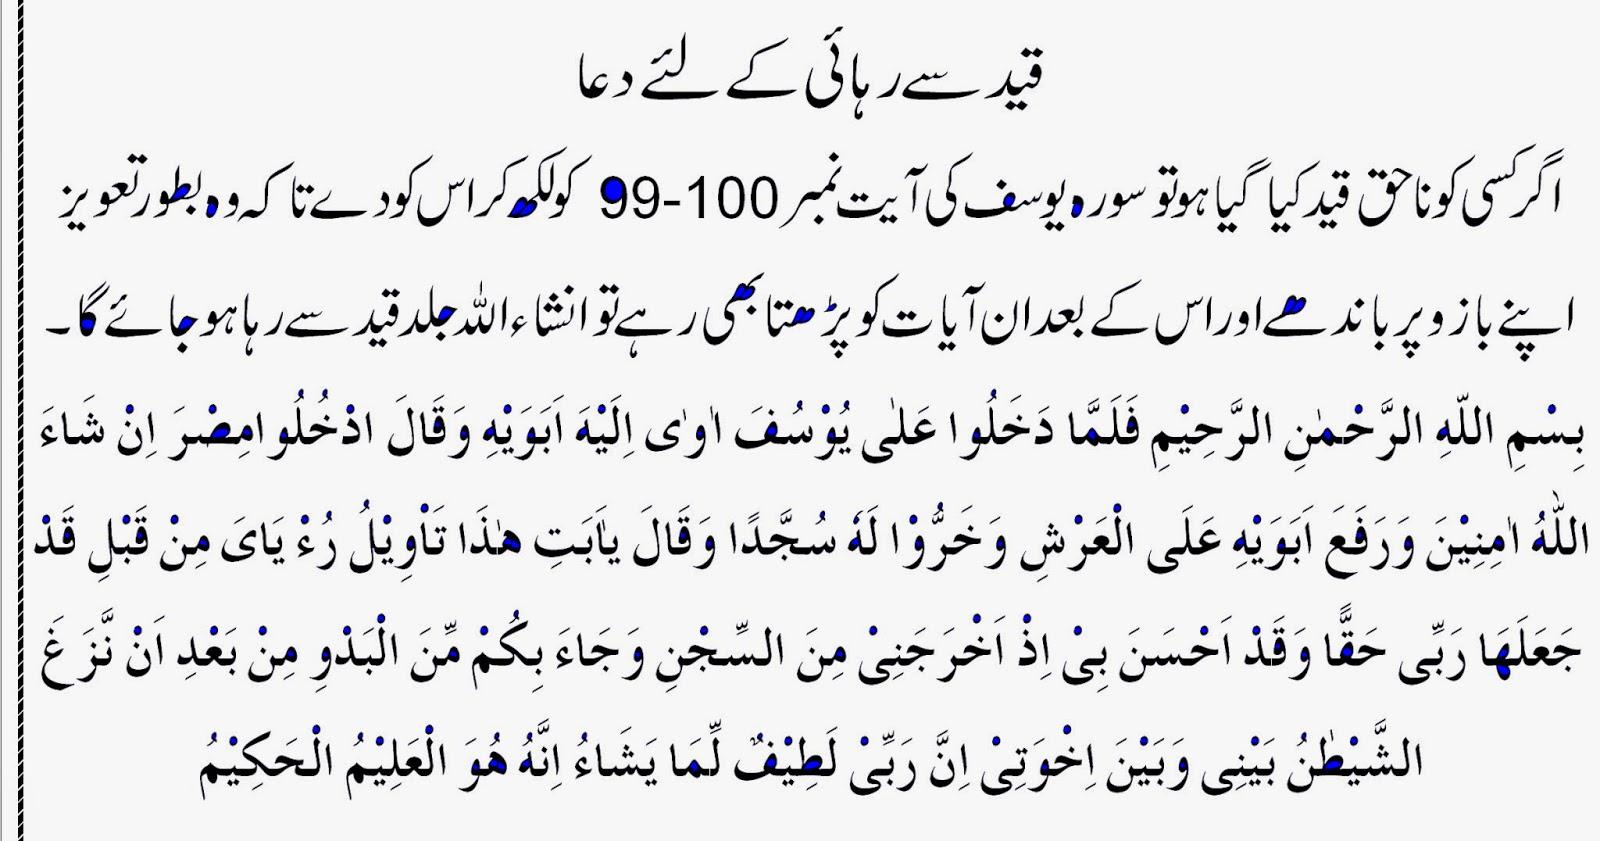 qaid say rihai k liye Qurani Dua